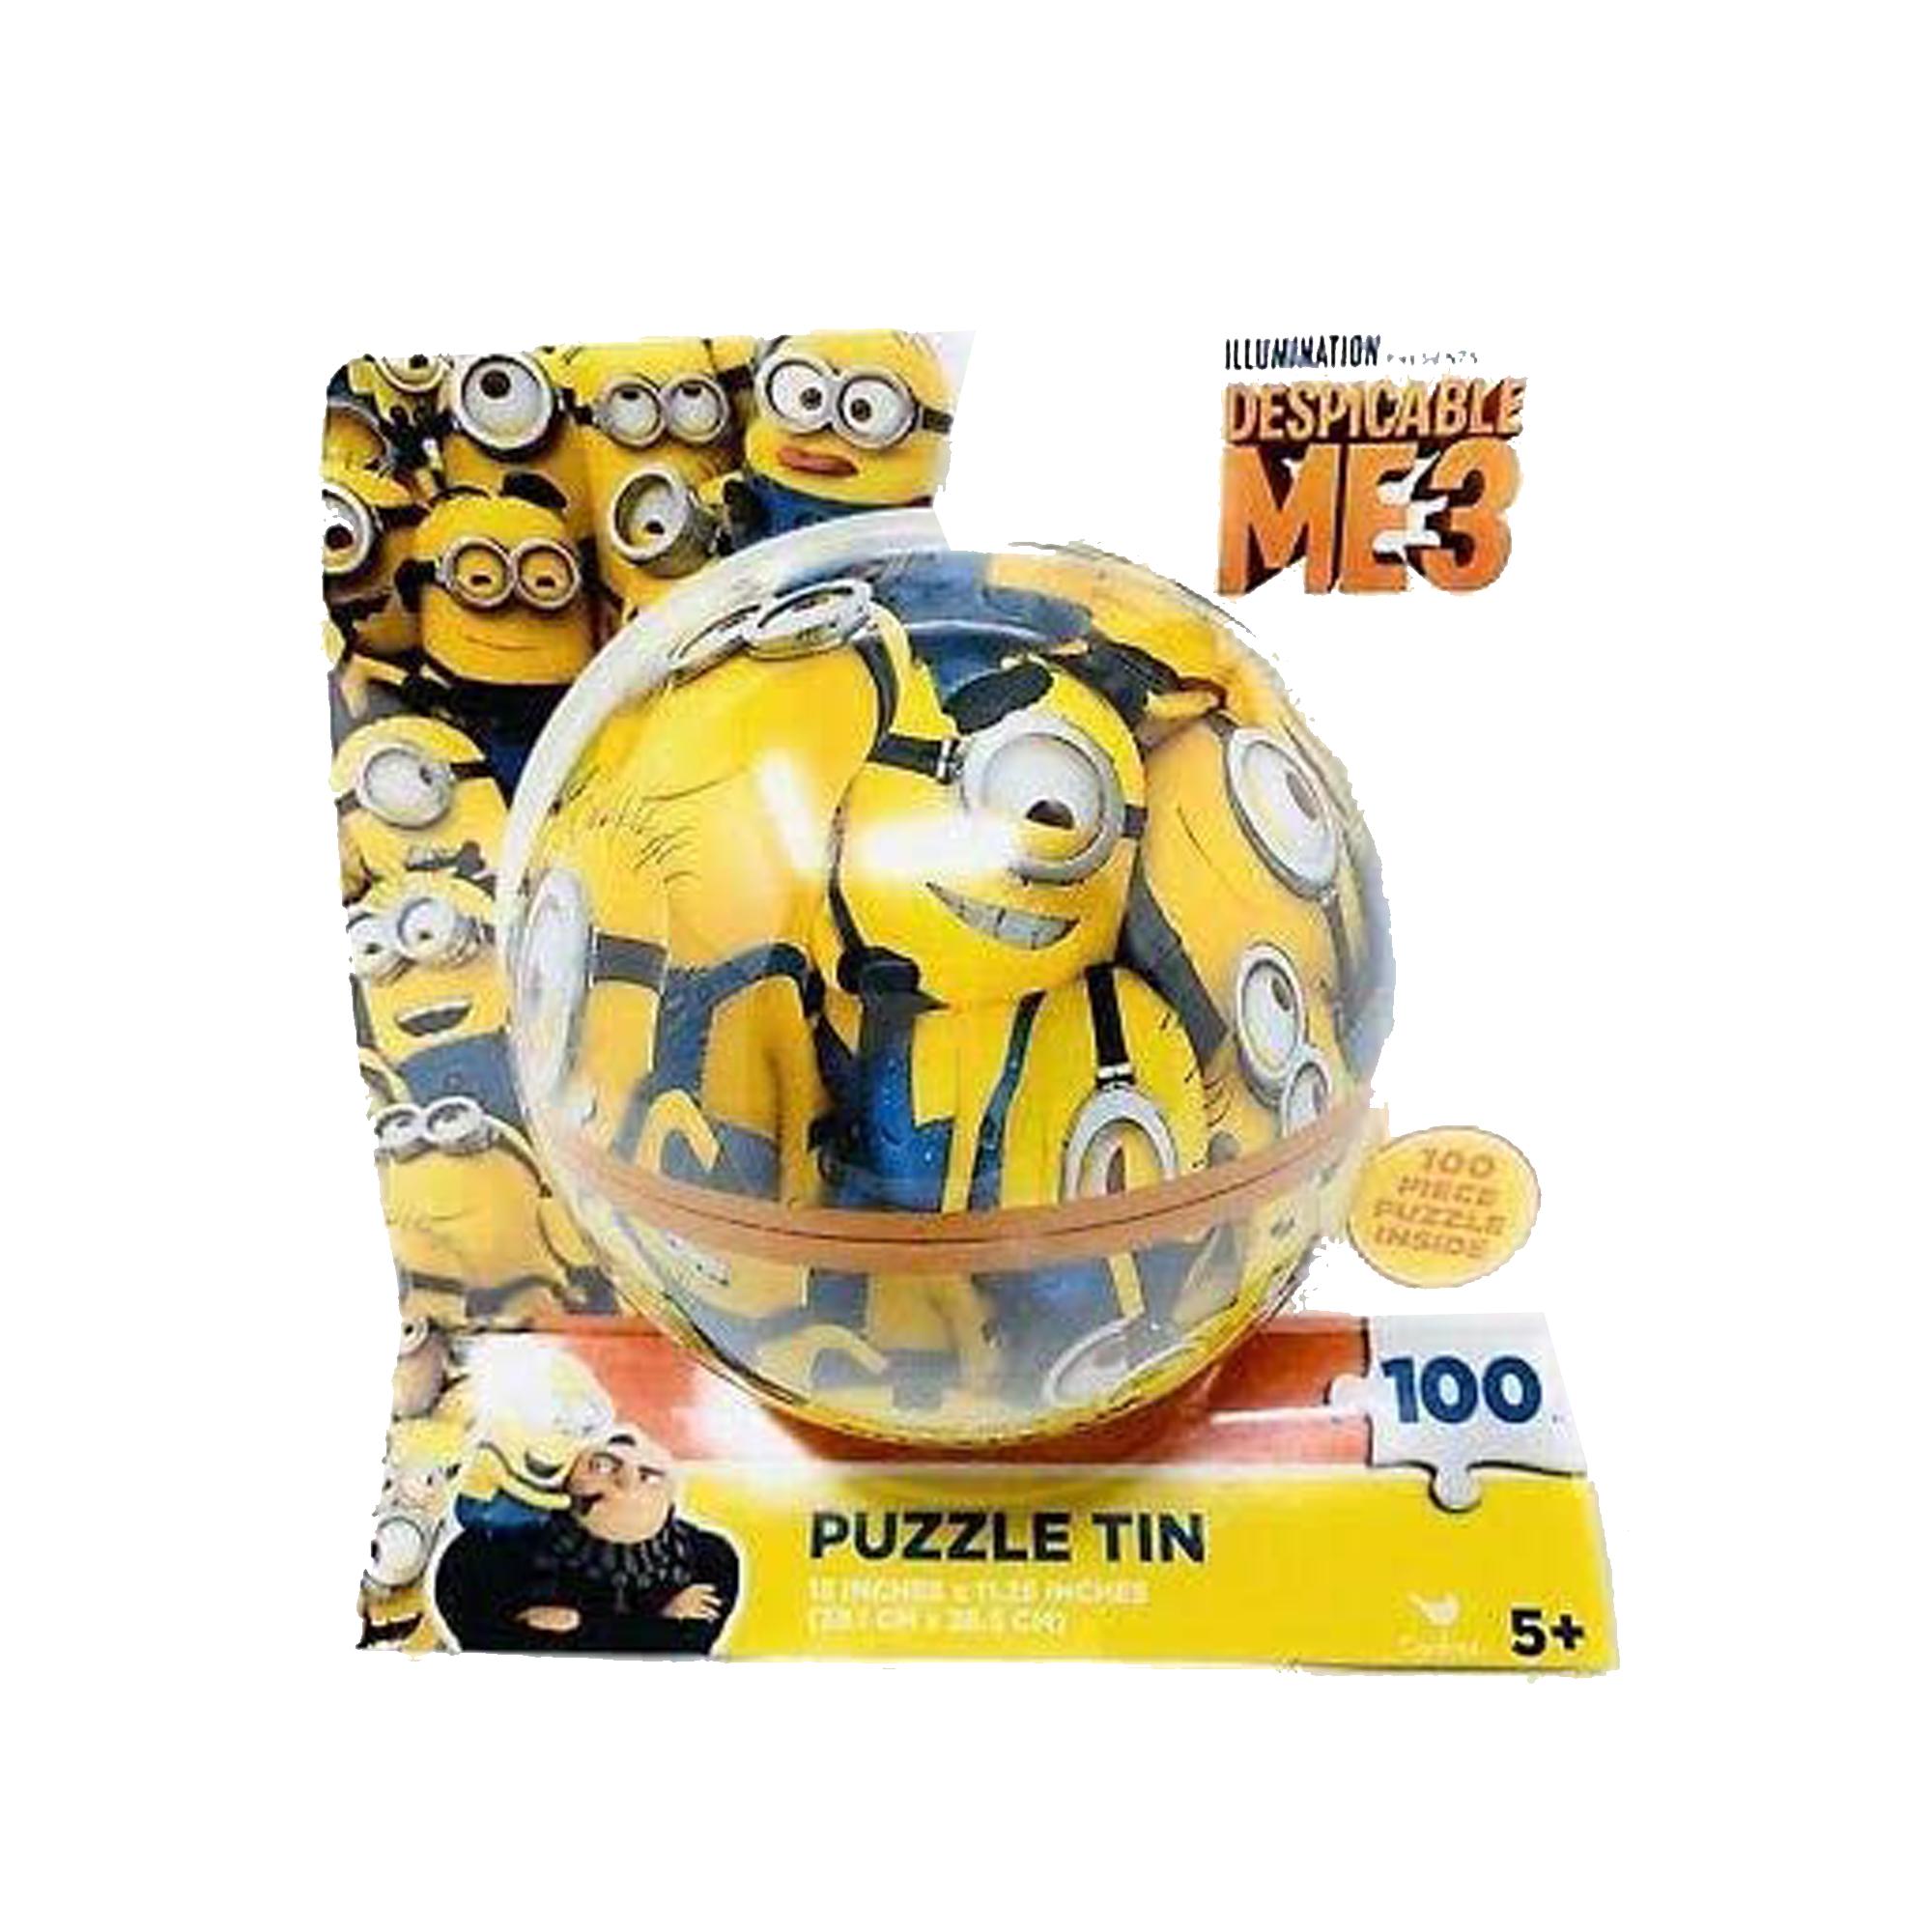 100 puzzle tin: despicable me 3